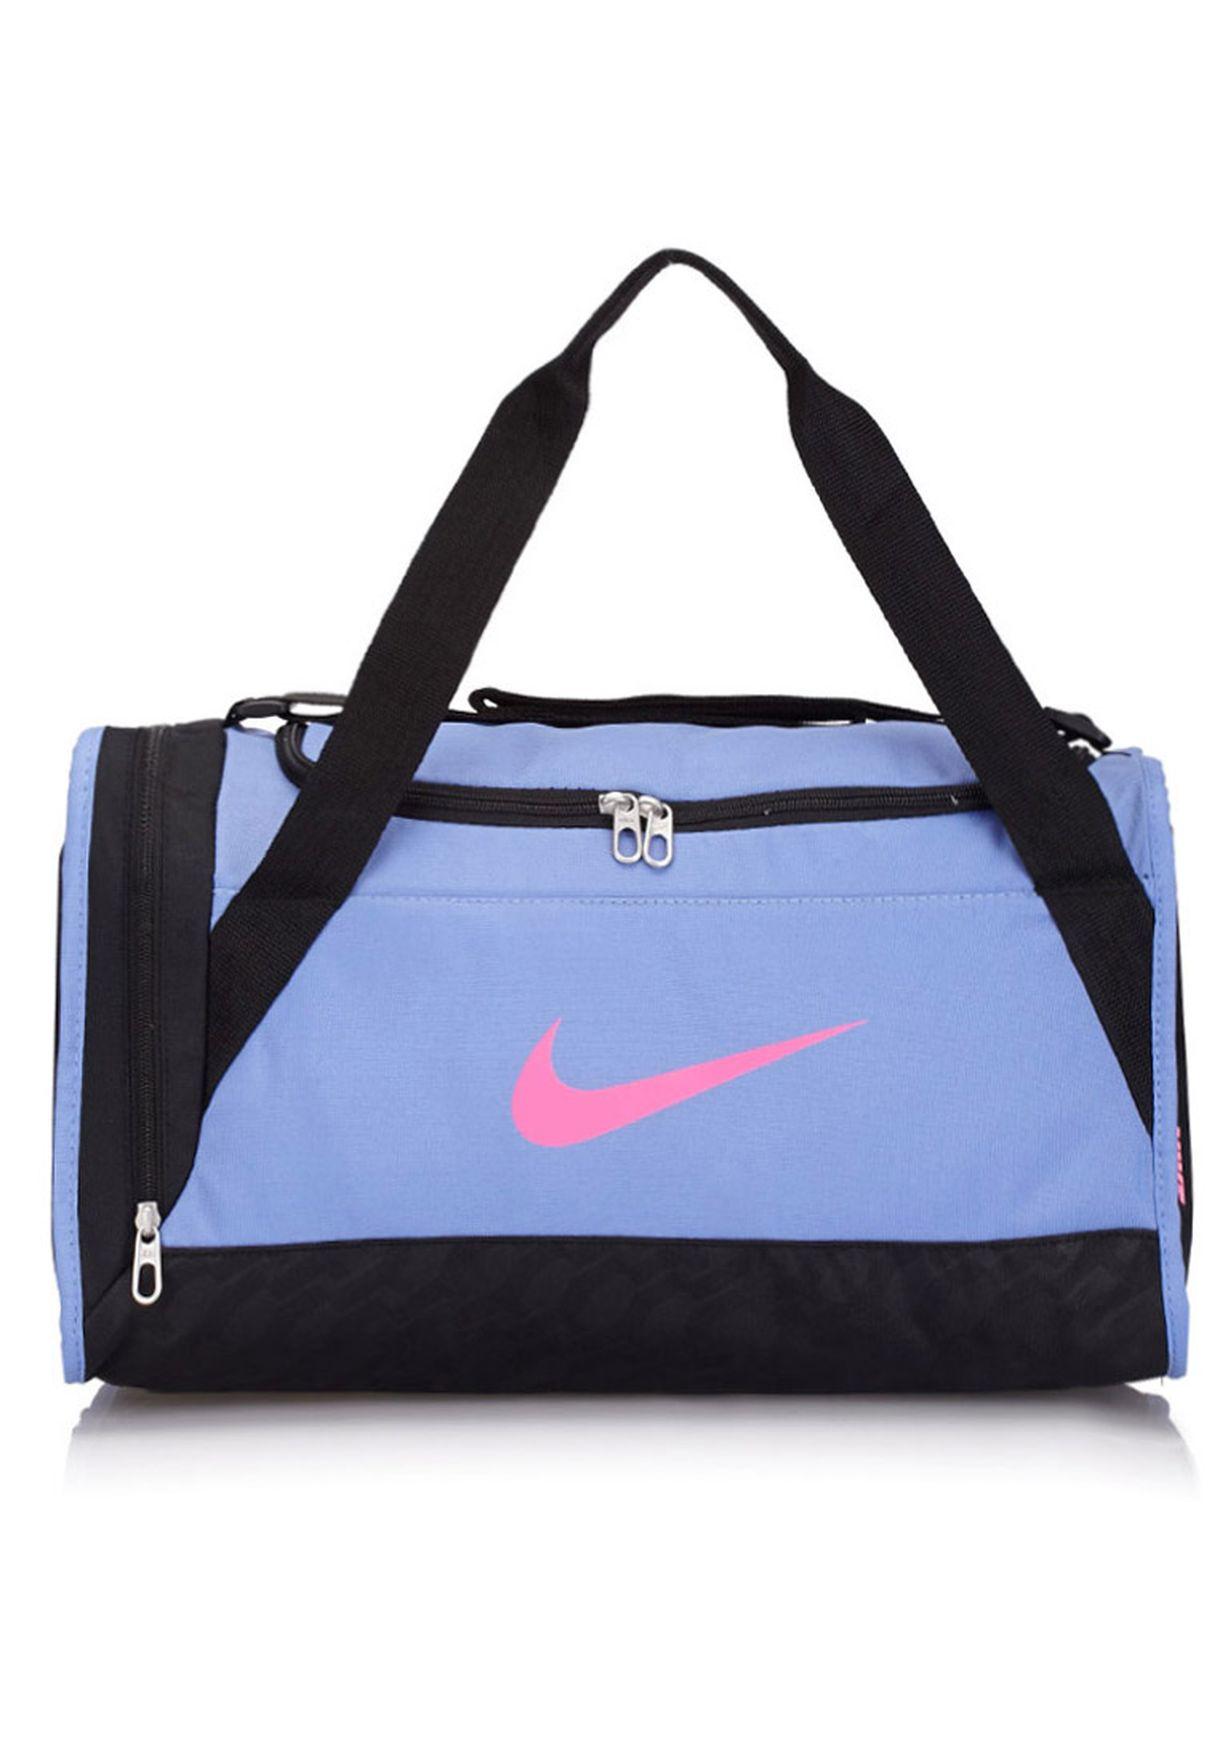 86d3b2b3c7f4 Shop Nike blue Extra Small Brasilia 6 Duffel BA4911-463 for Women in ...